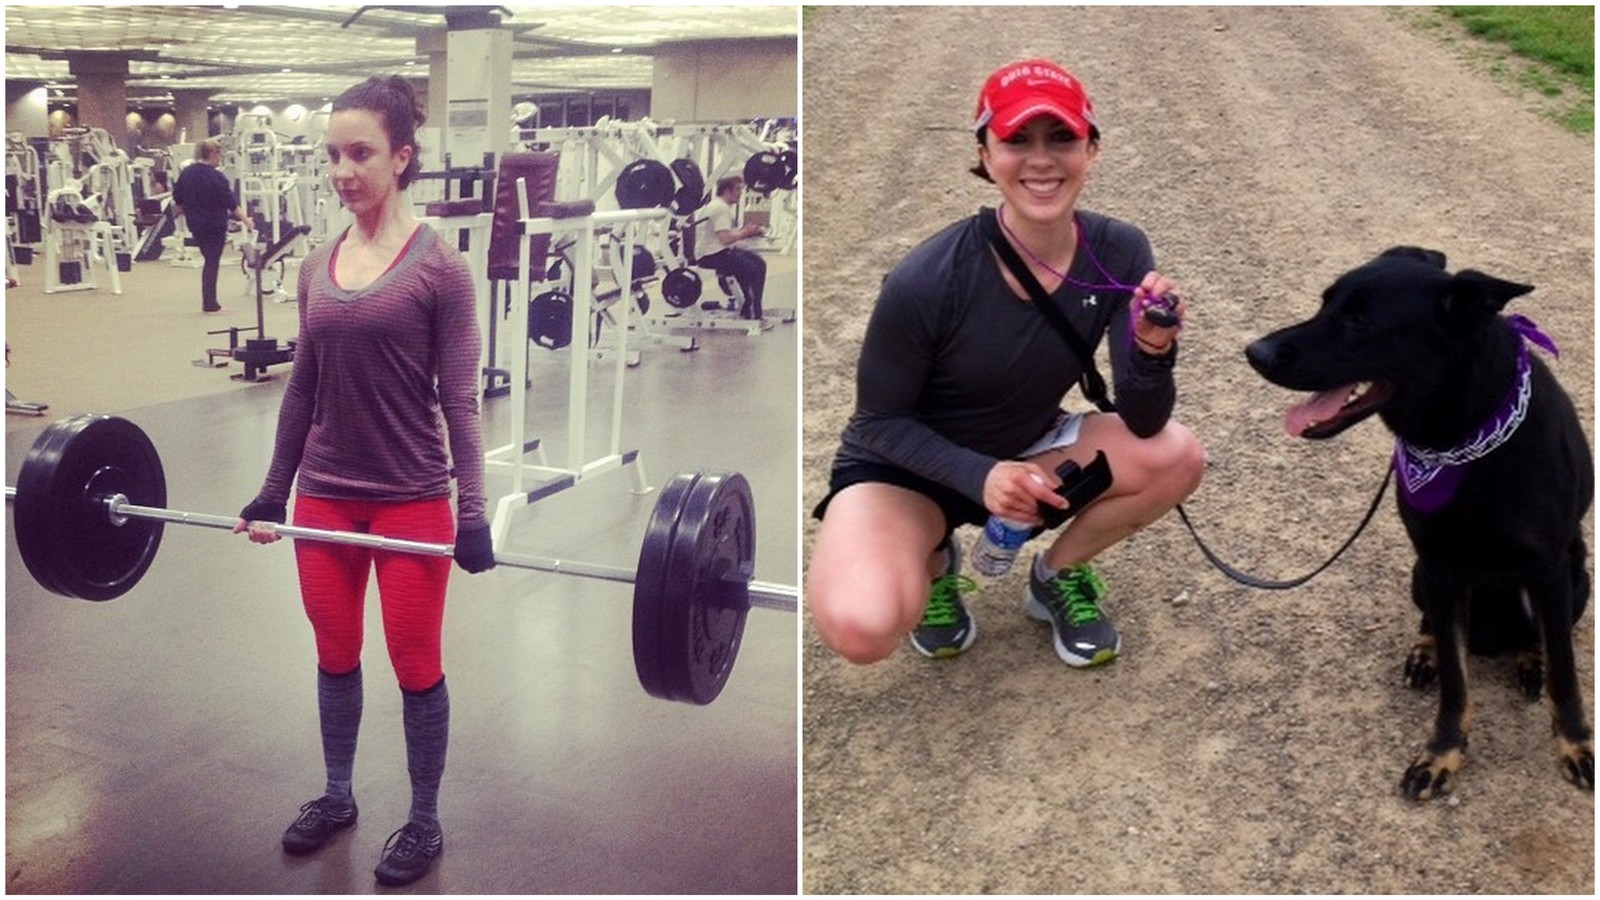 Katy's Healing Story (Inflammatory Arthritis & Crohn's Disease) | Phoenix Helix